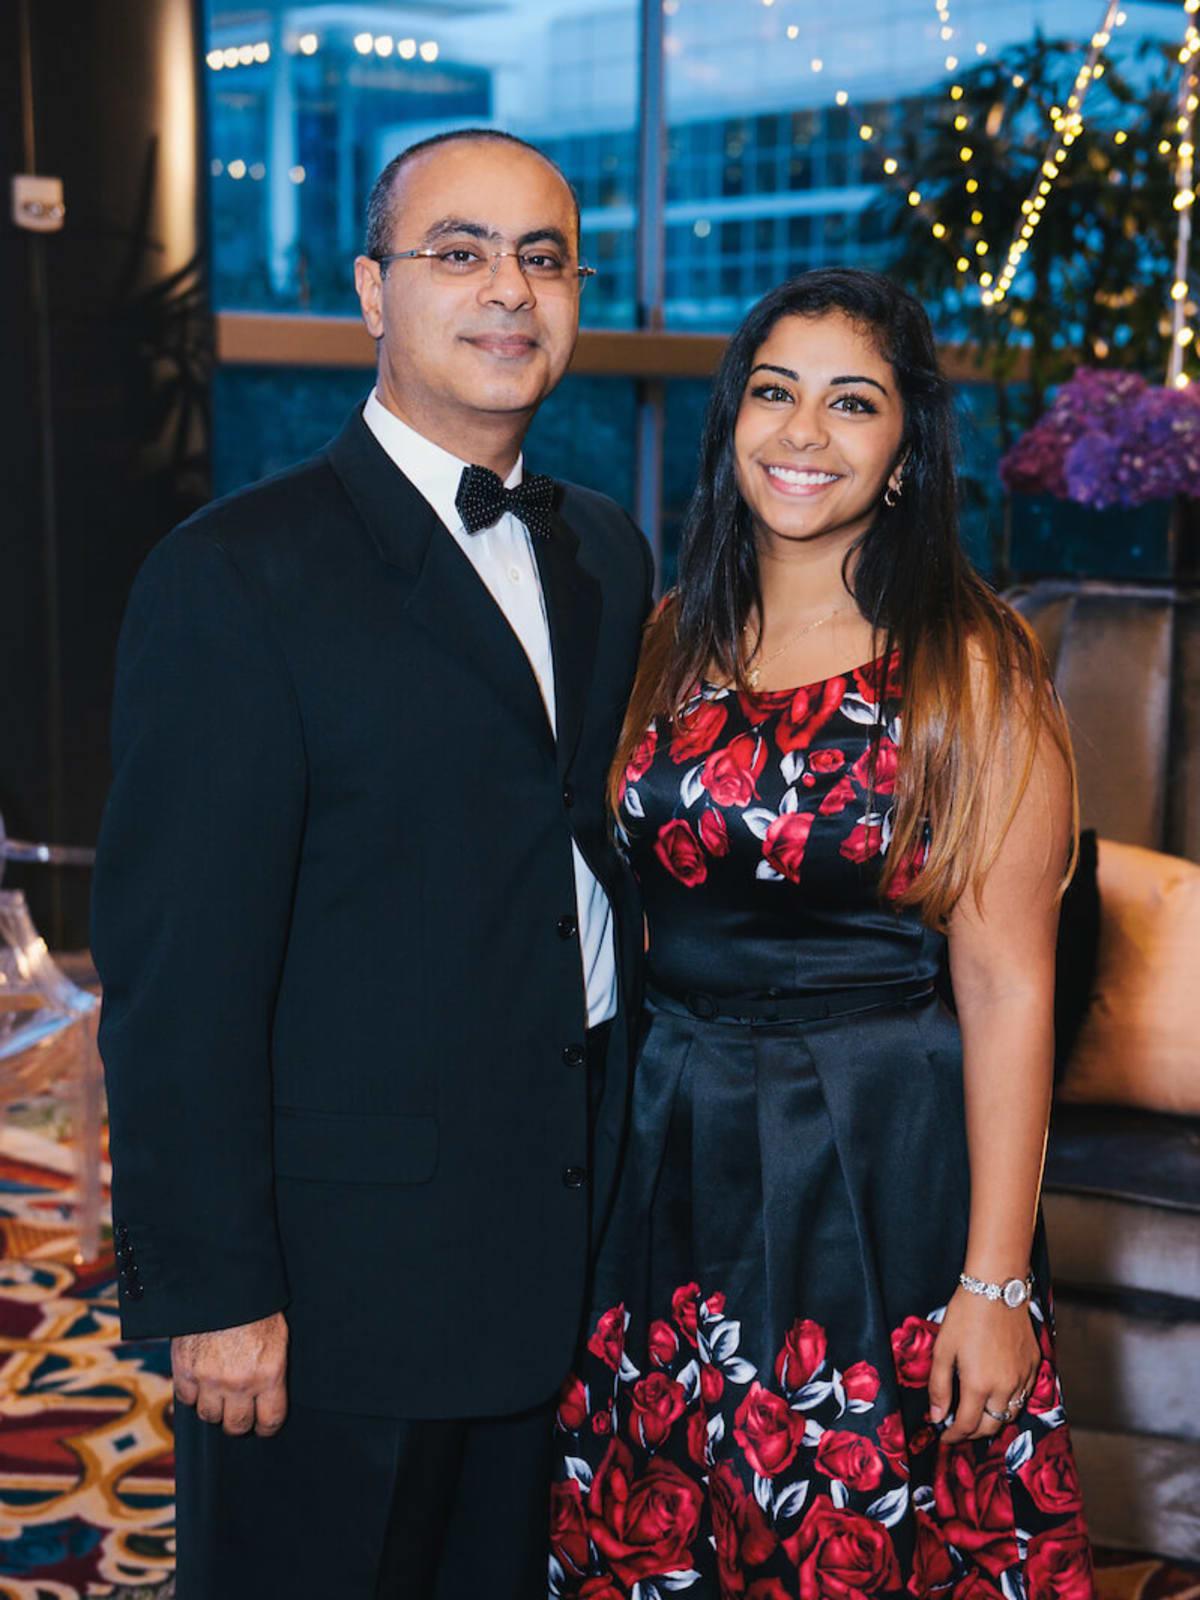 Dr. Maged Mina, Marina Mina at UTHealth Constellation Gala